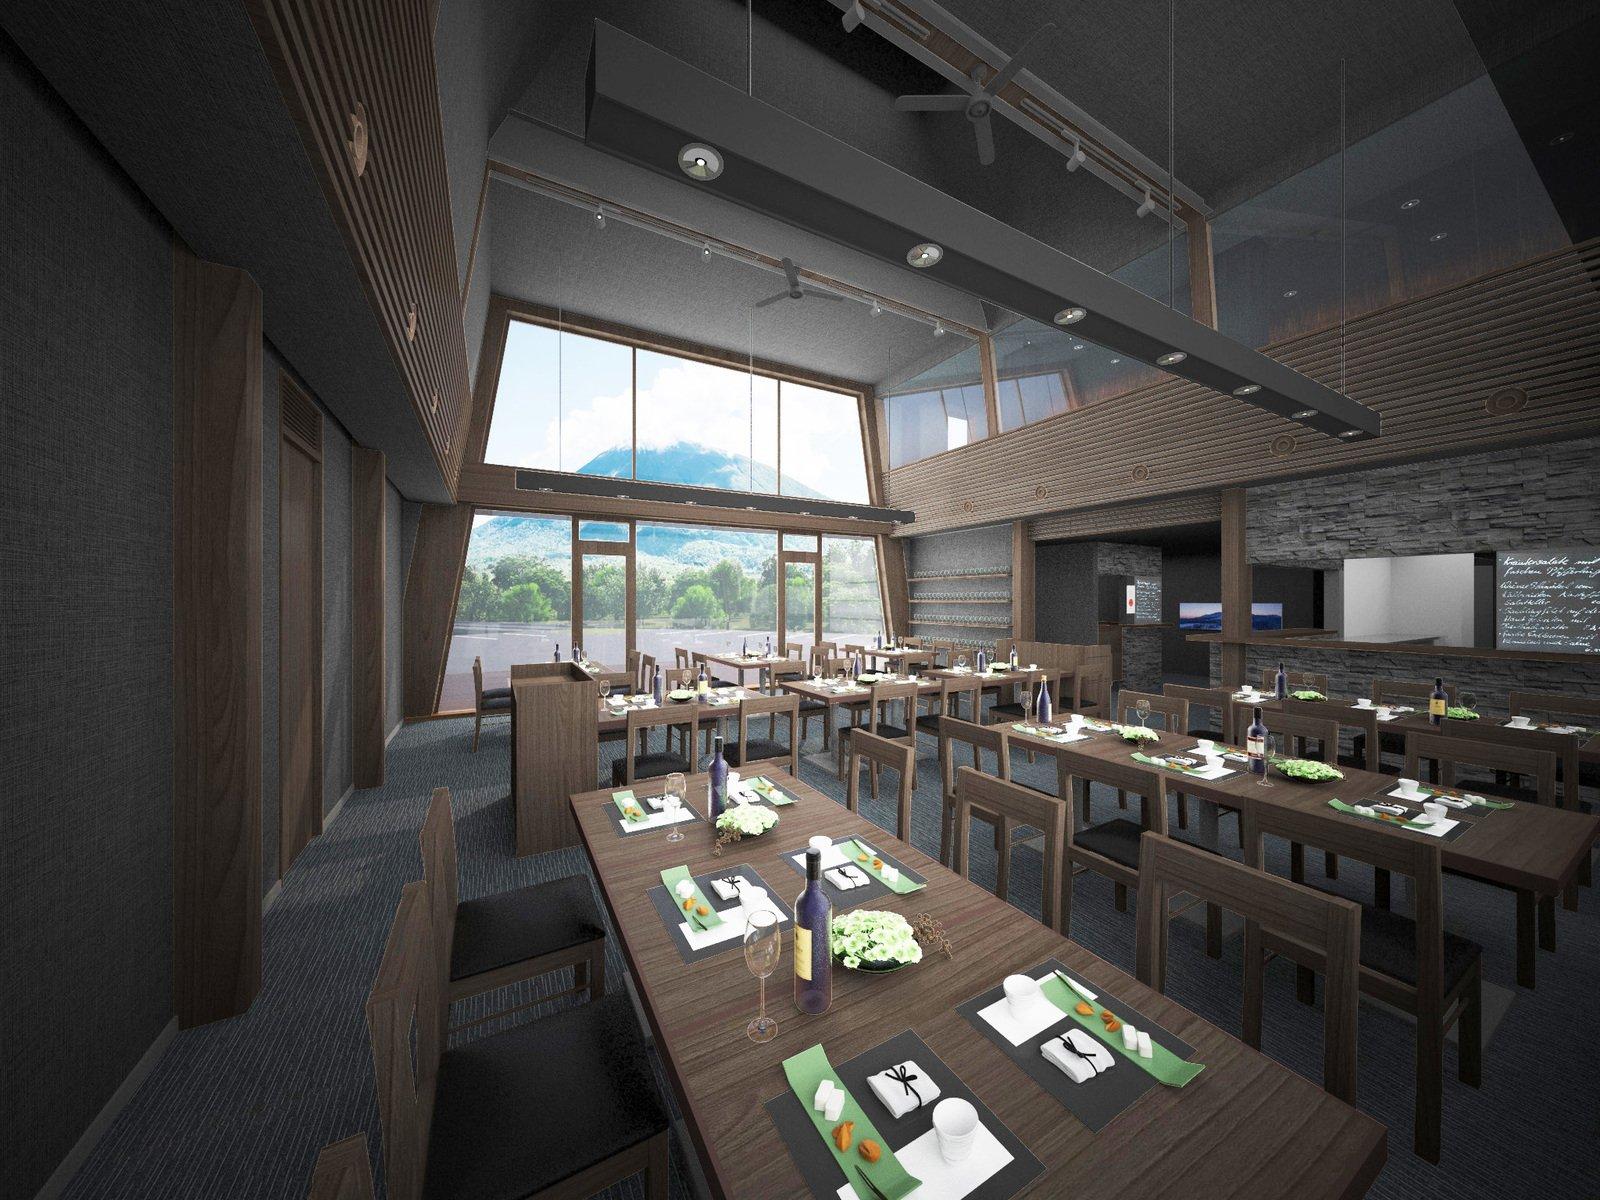 Panorama niseko clubhouse 1 large